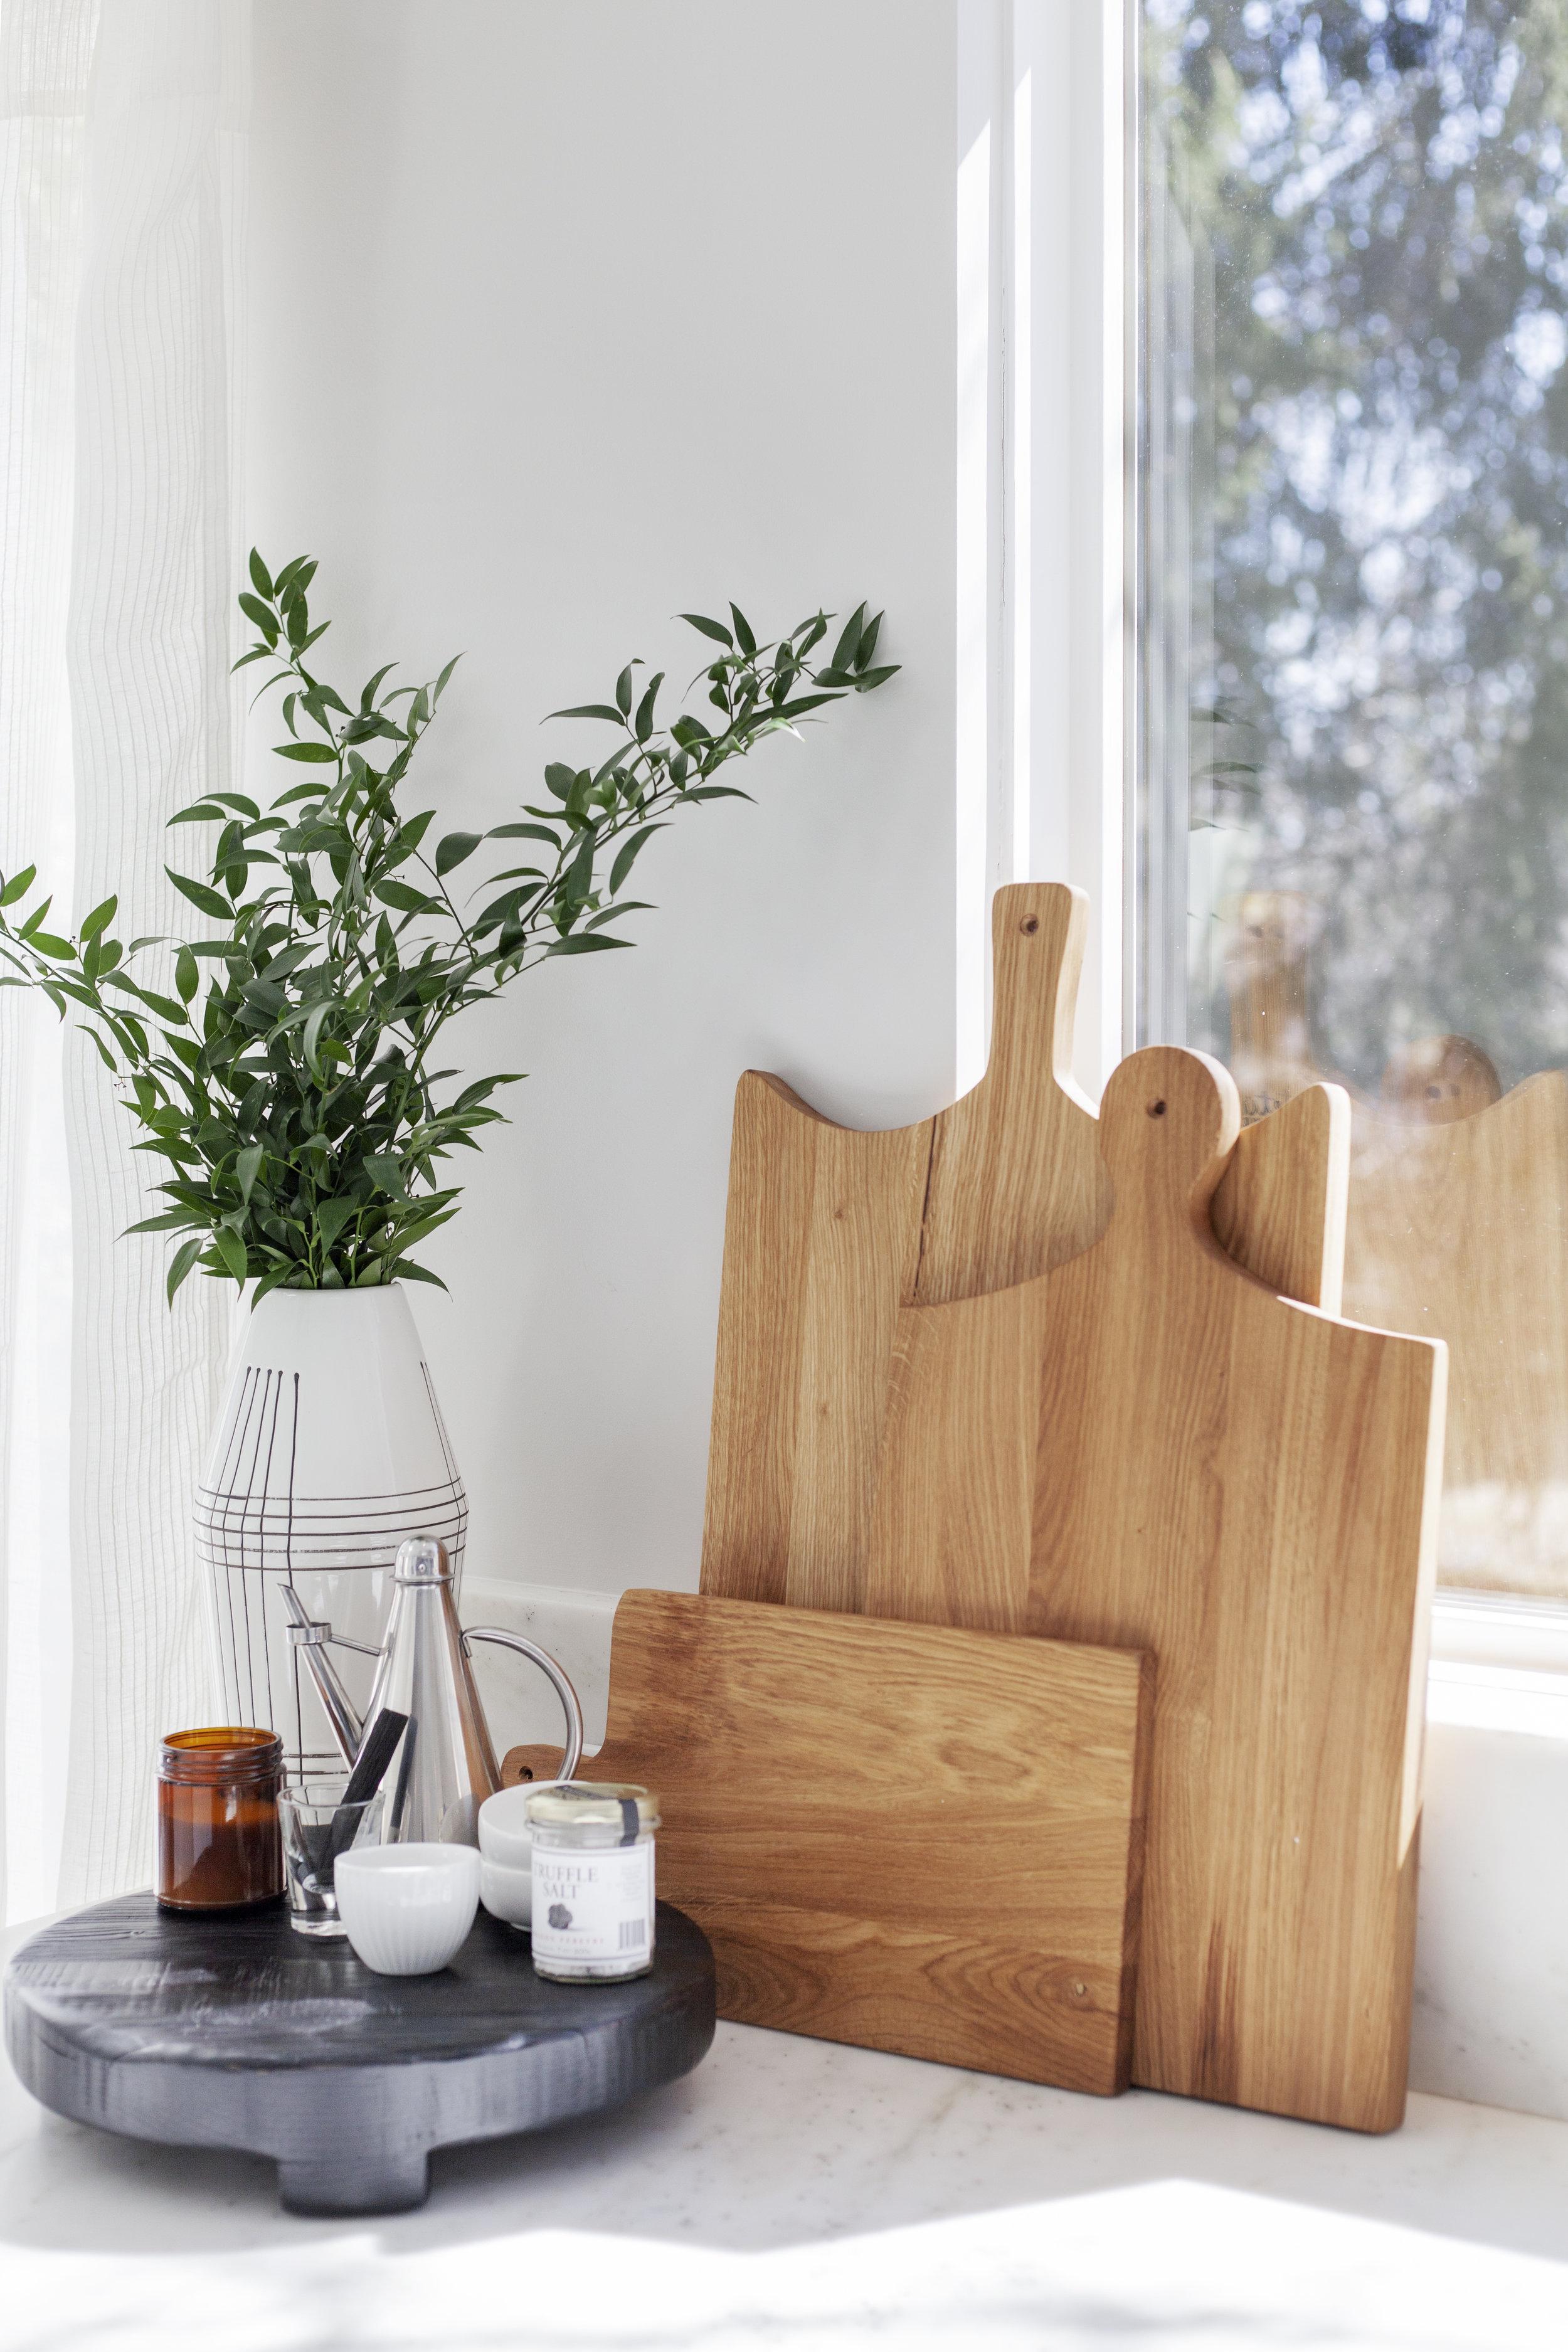 SHOP THE LOOK:   White Stripe Modern Vase,   European Cutting Boards (Set of 3) ,  Brasserie Round Trivet